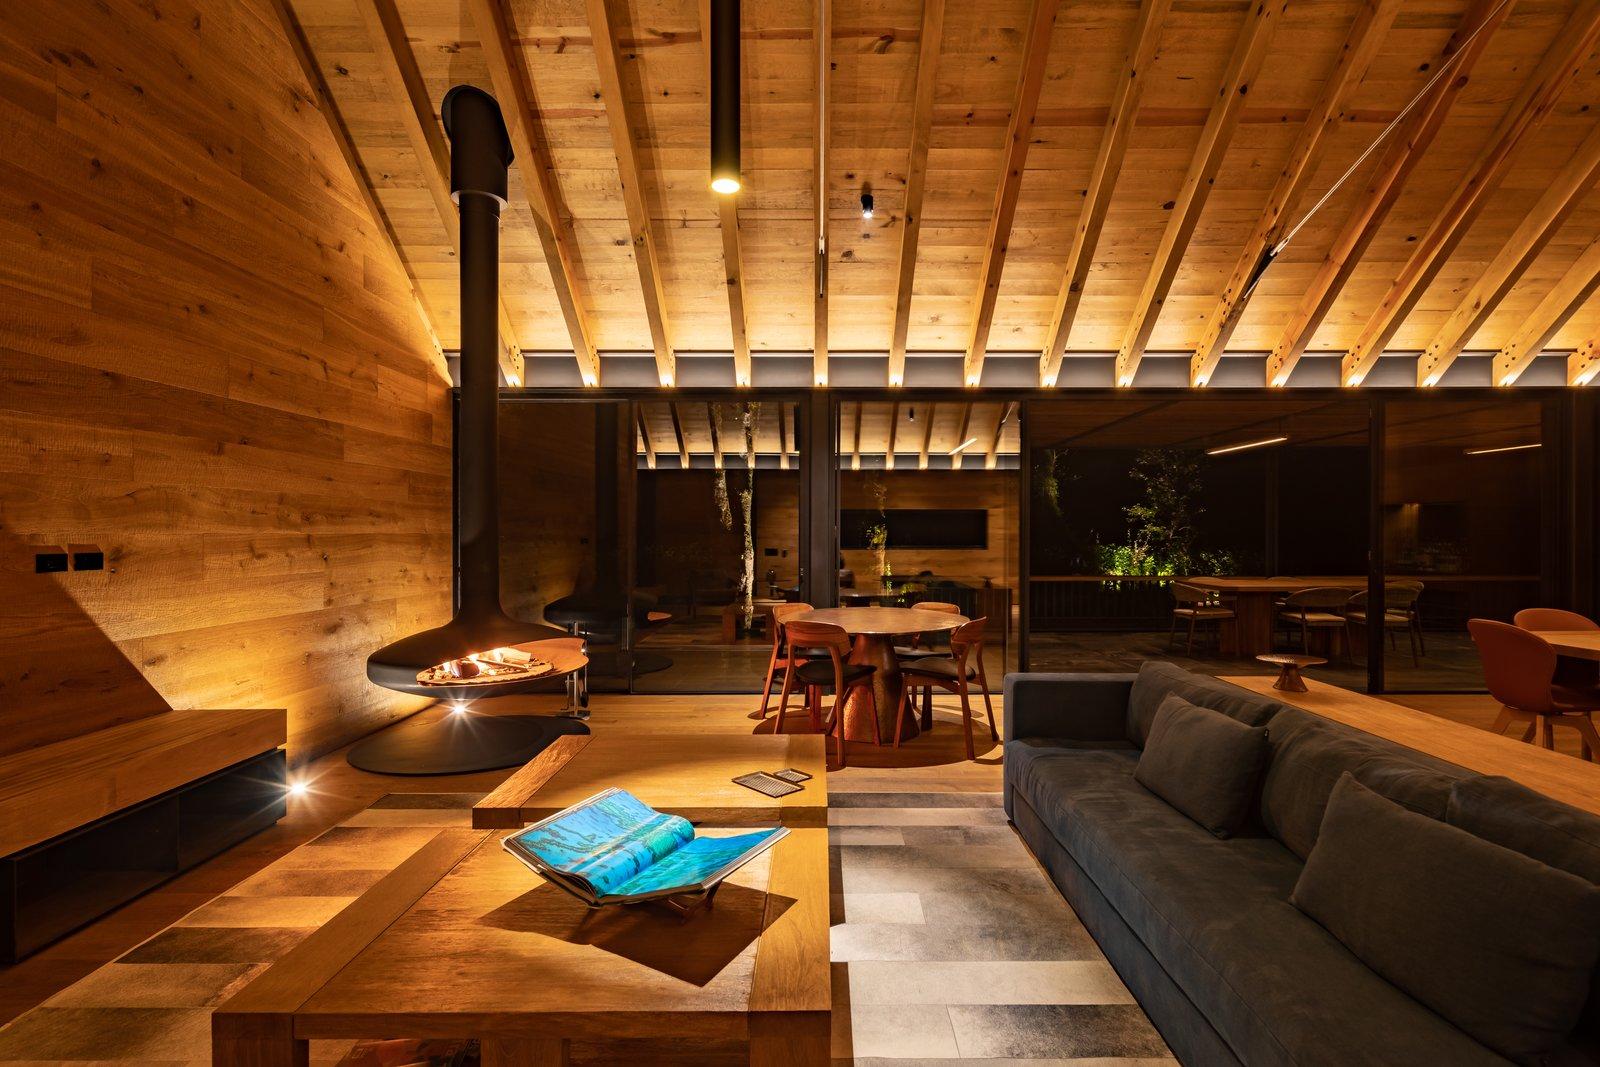 Living Room, Bench, Wall Lighting, Hanging Fireplace, Medium Hardwood Floor, Sofa, and Ceiling Lighting  L7 Home by Augusto Fernandez